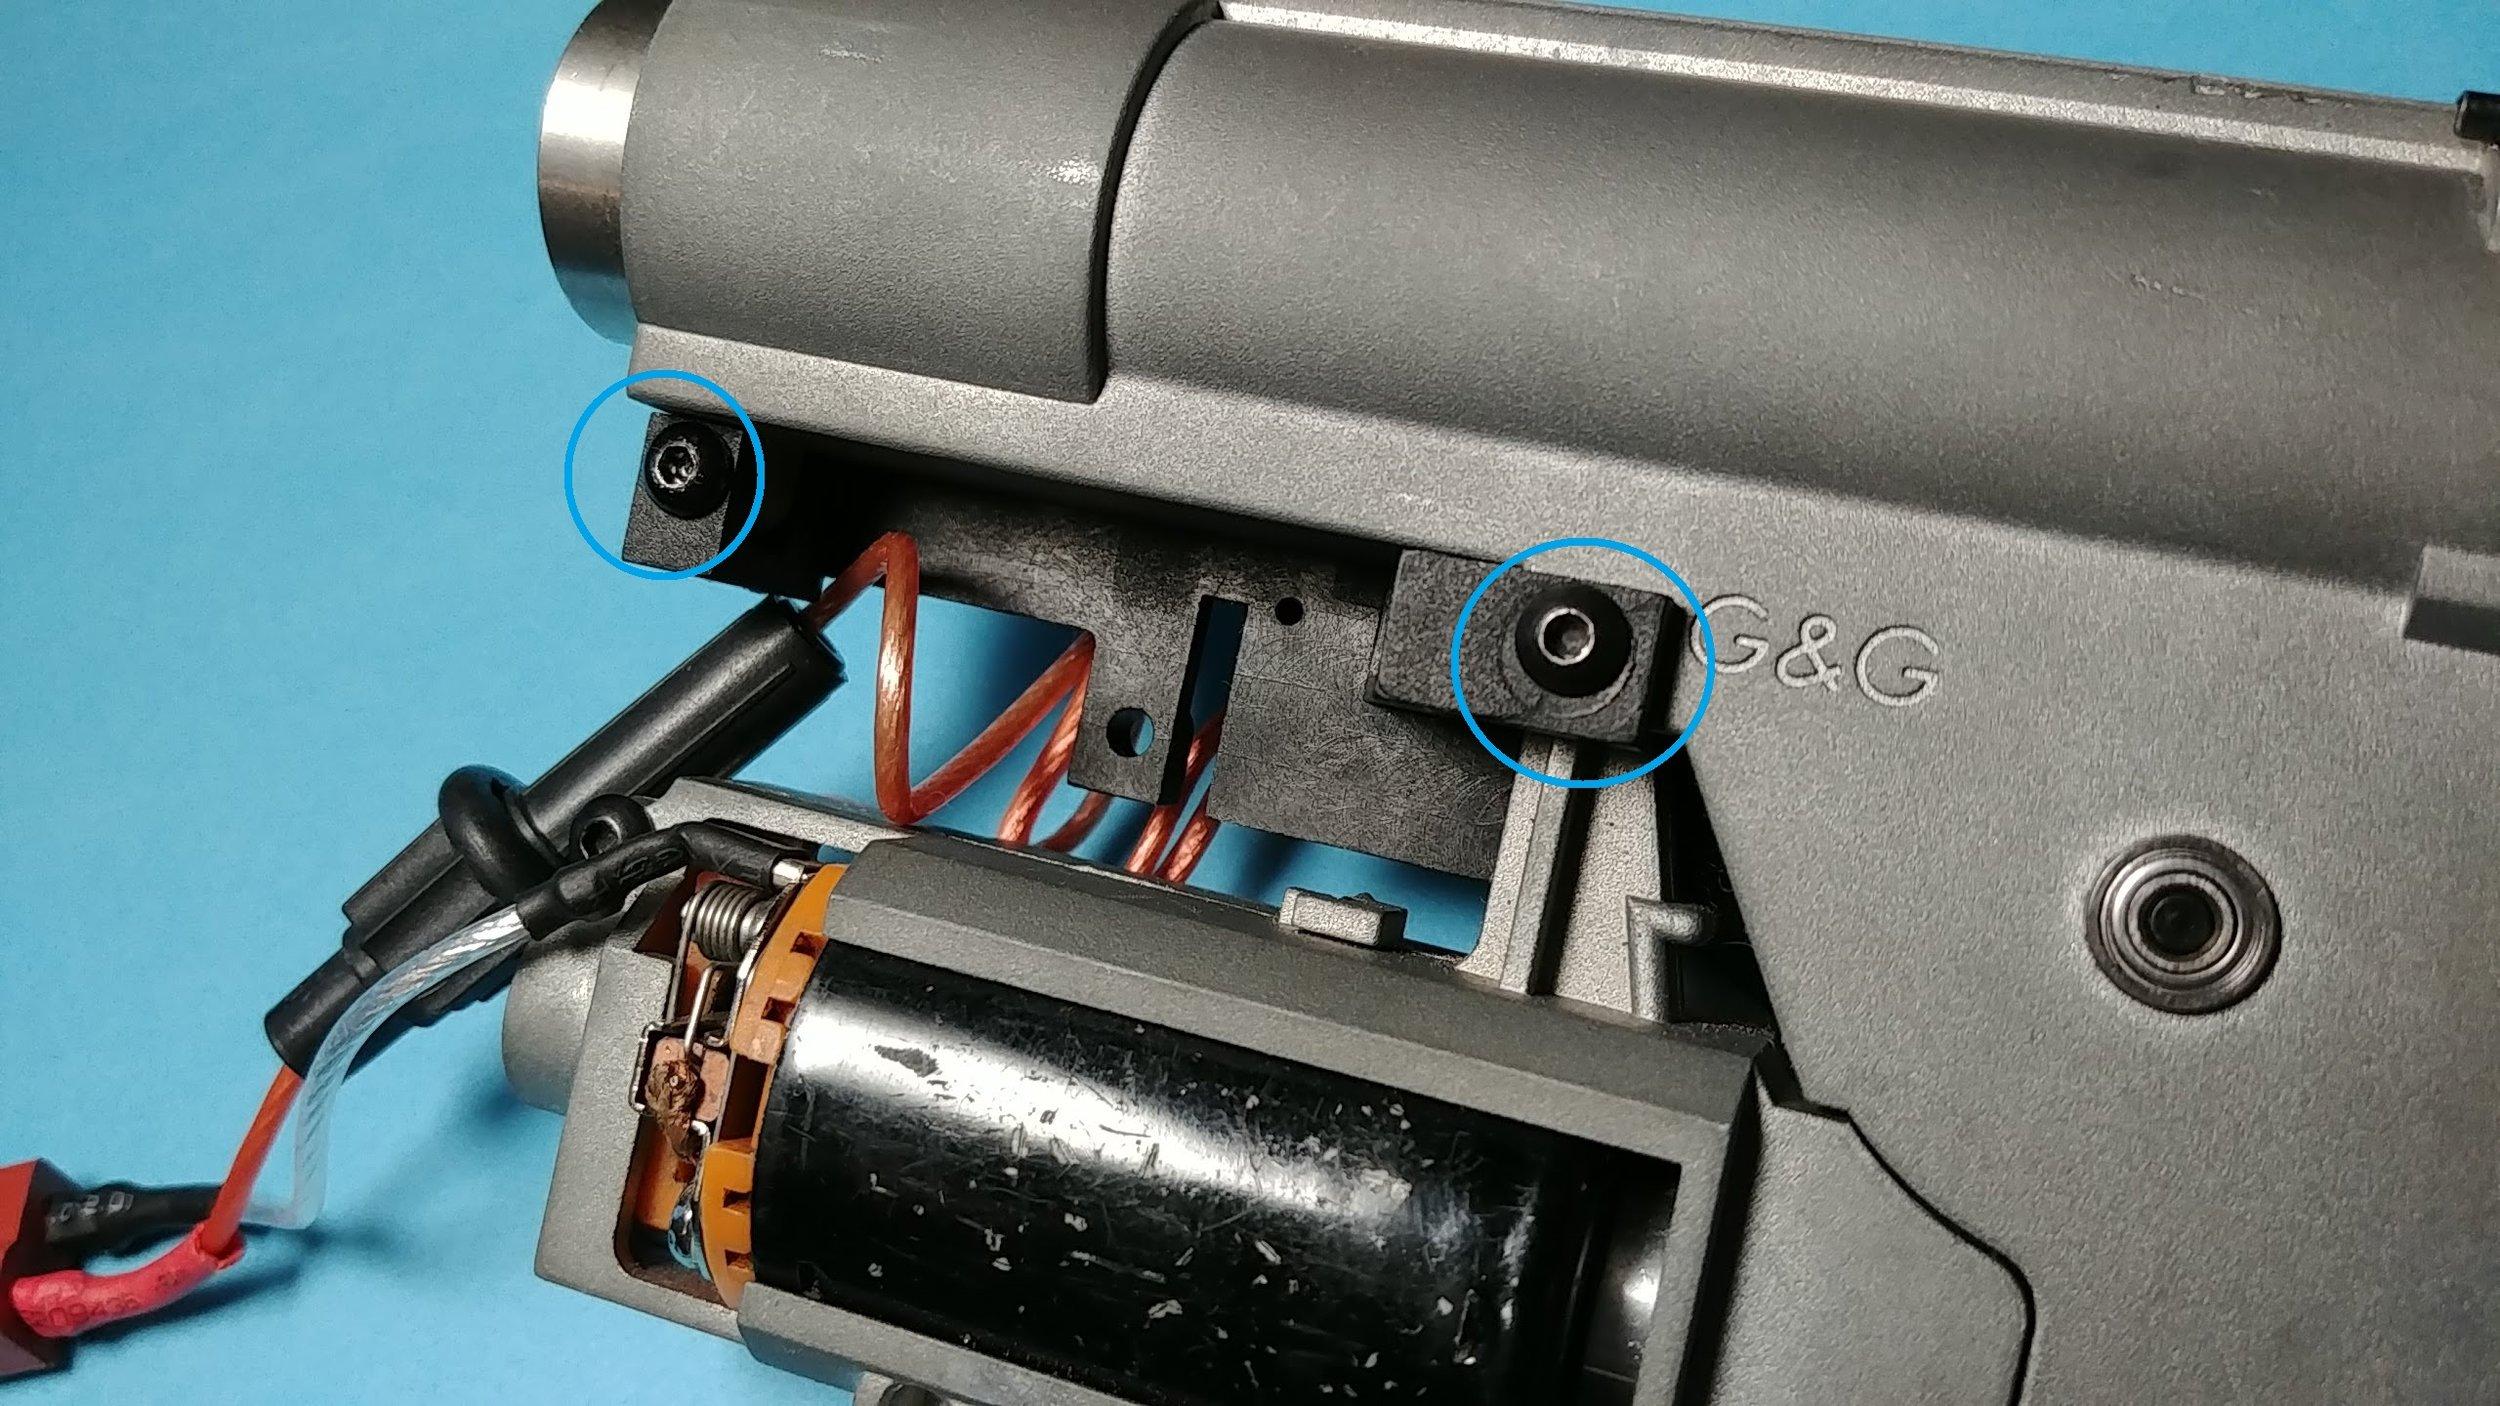 Remove screws to take off trigger unit